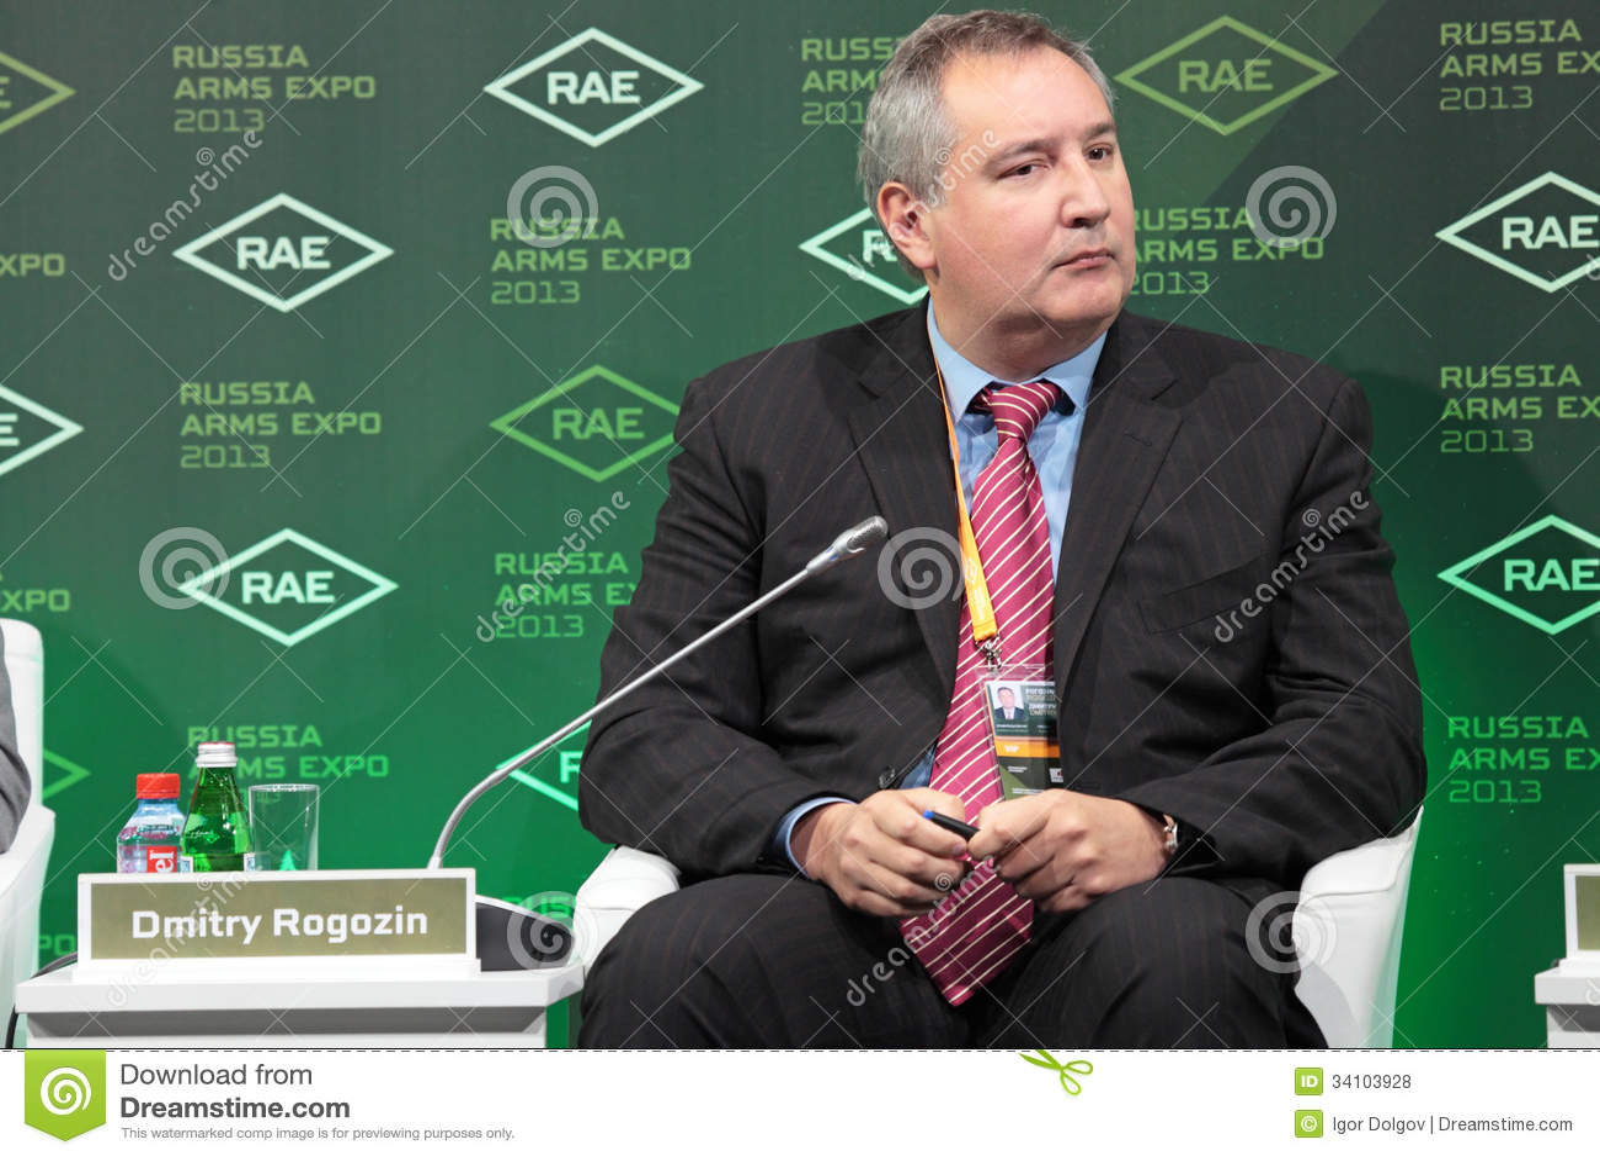 Dmitry Rogozin Editorial Stock Photo - Image: 34103928